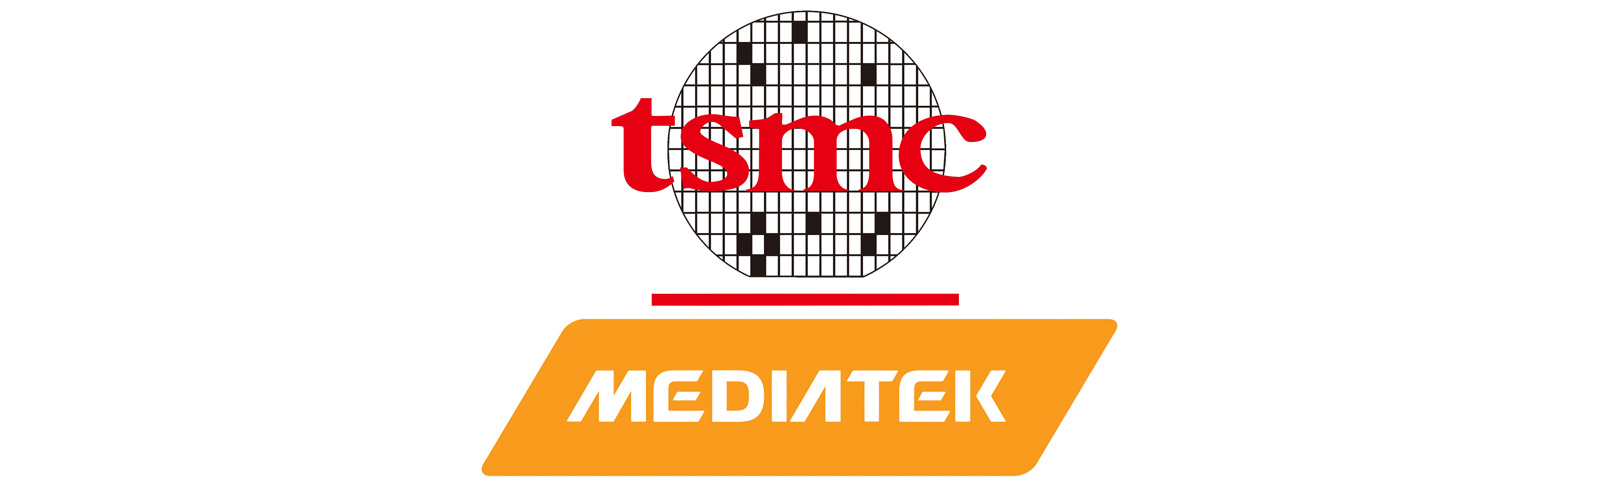 The MediaTek S900 enters volume production